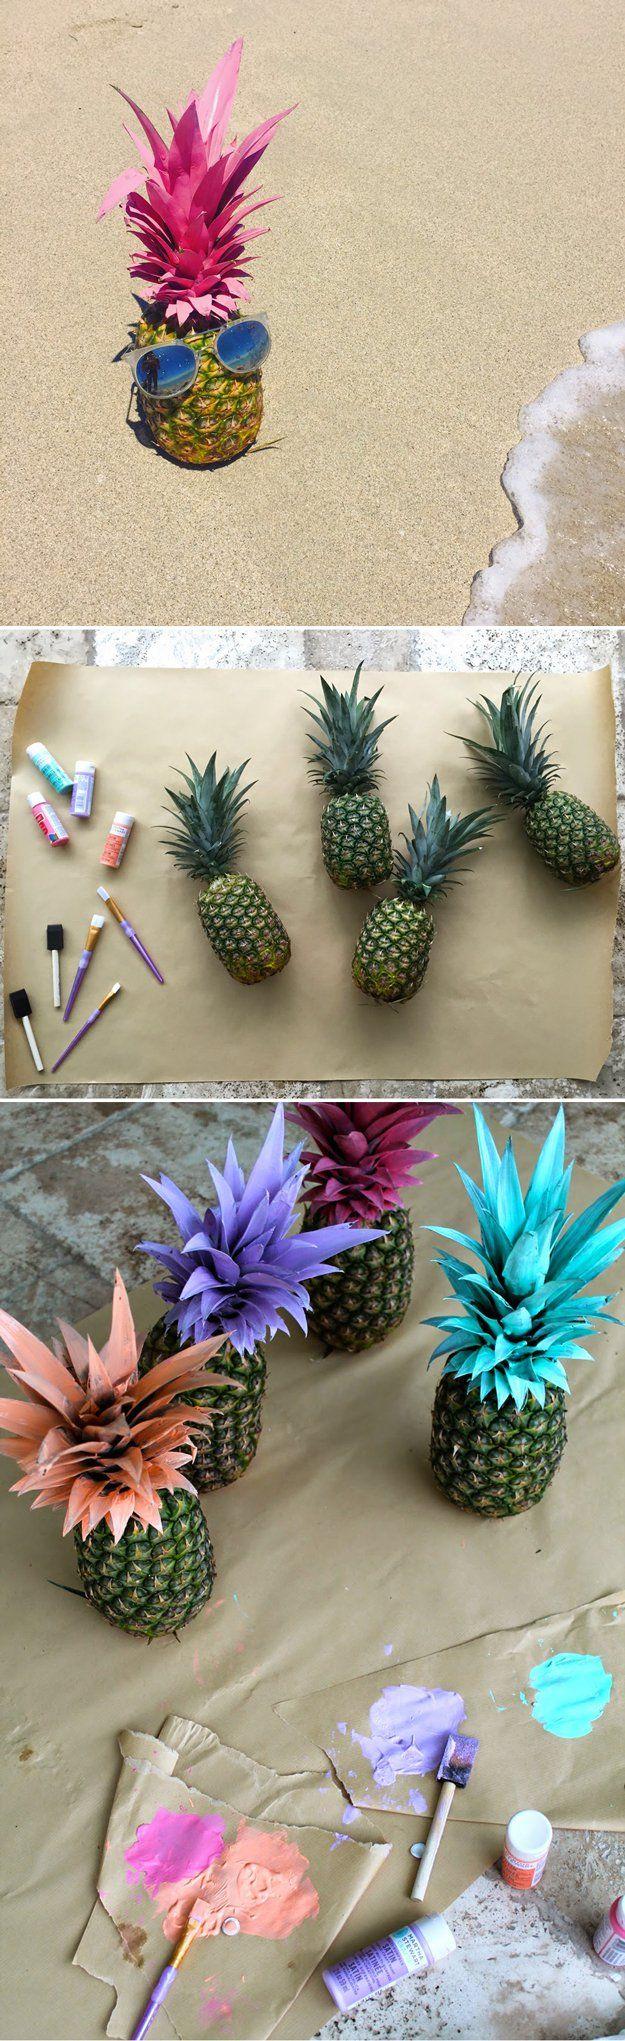 Beach party table decorations diy beach party ideas for your beachthemed celebration  decoration